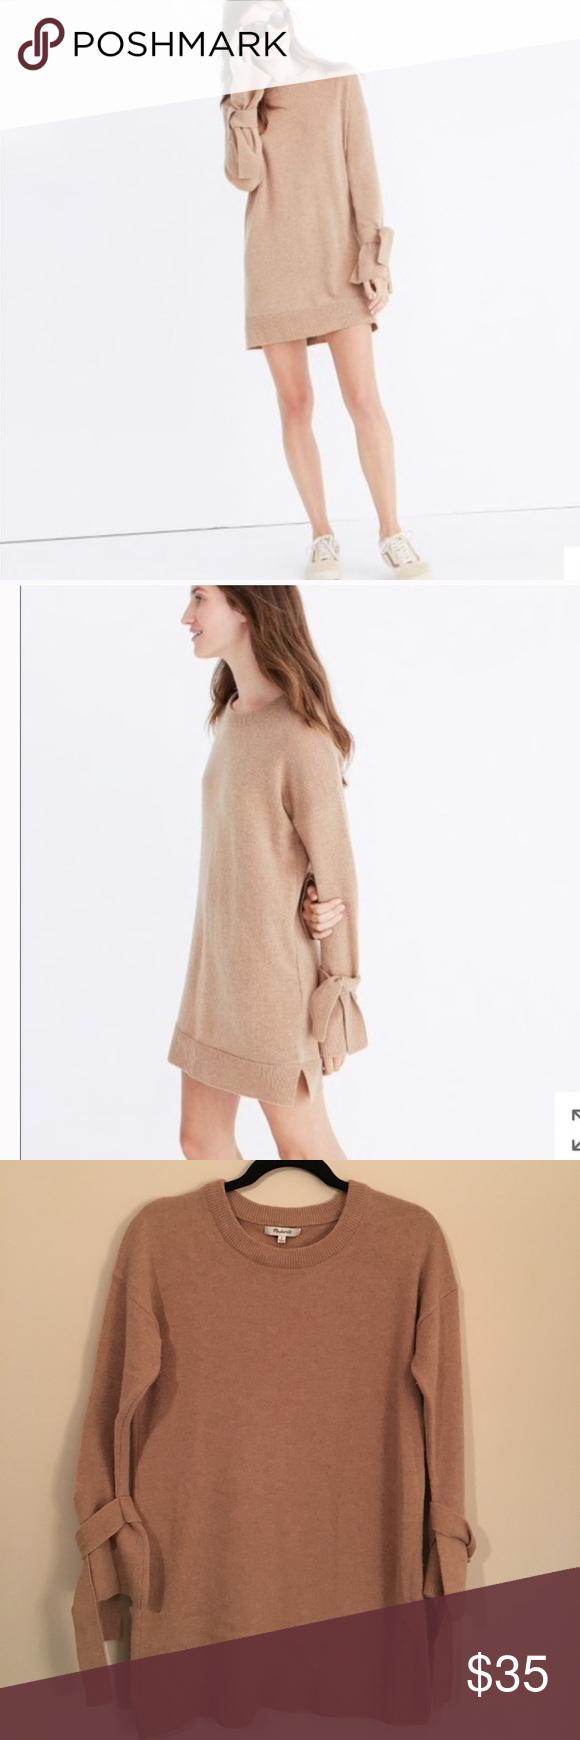 68cc2bf384 Madewell • Tie Cuff Sweater Dress 100% Merino wool sweater dress. Small  pinholes In